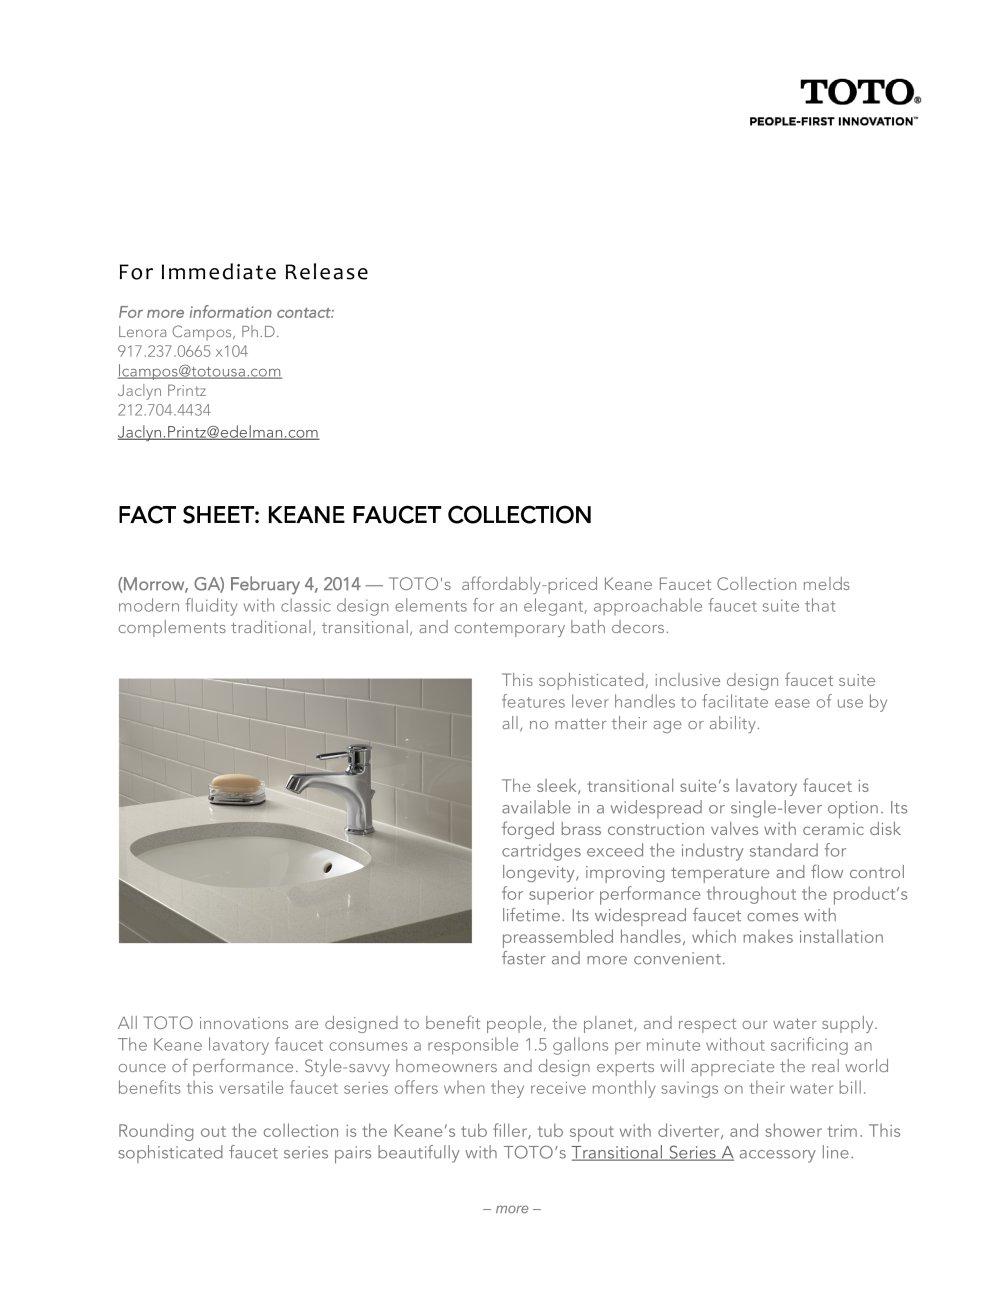 Keane faucet collection - Toto - PDF Catalogues | Documentation ...